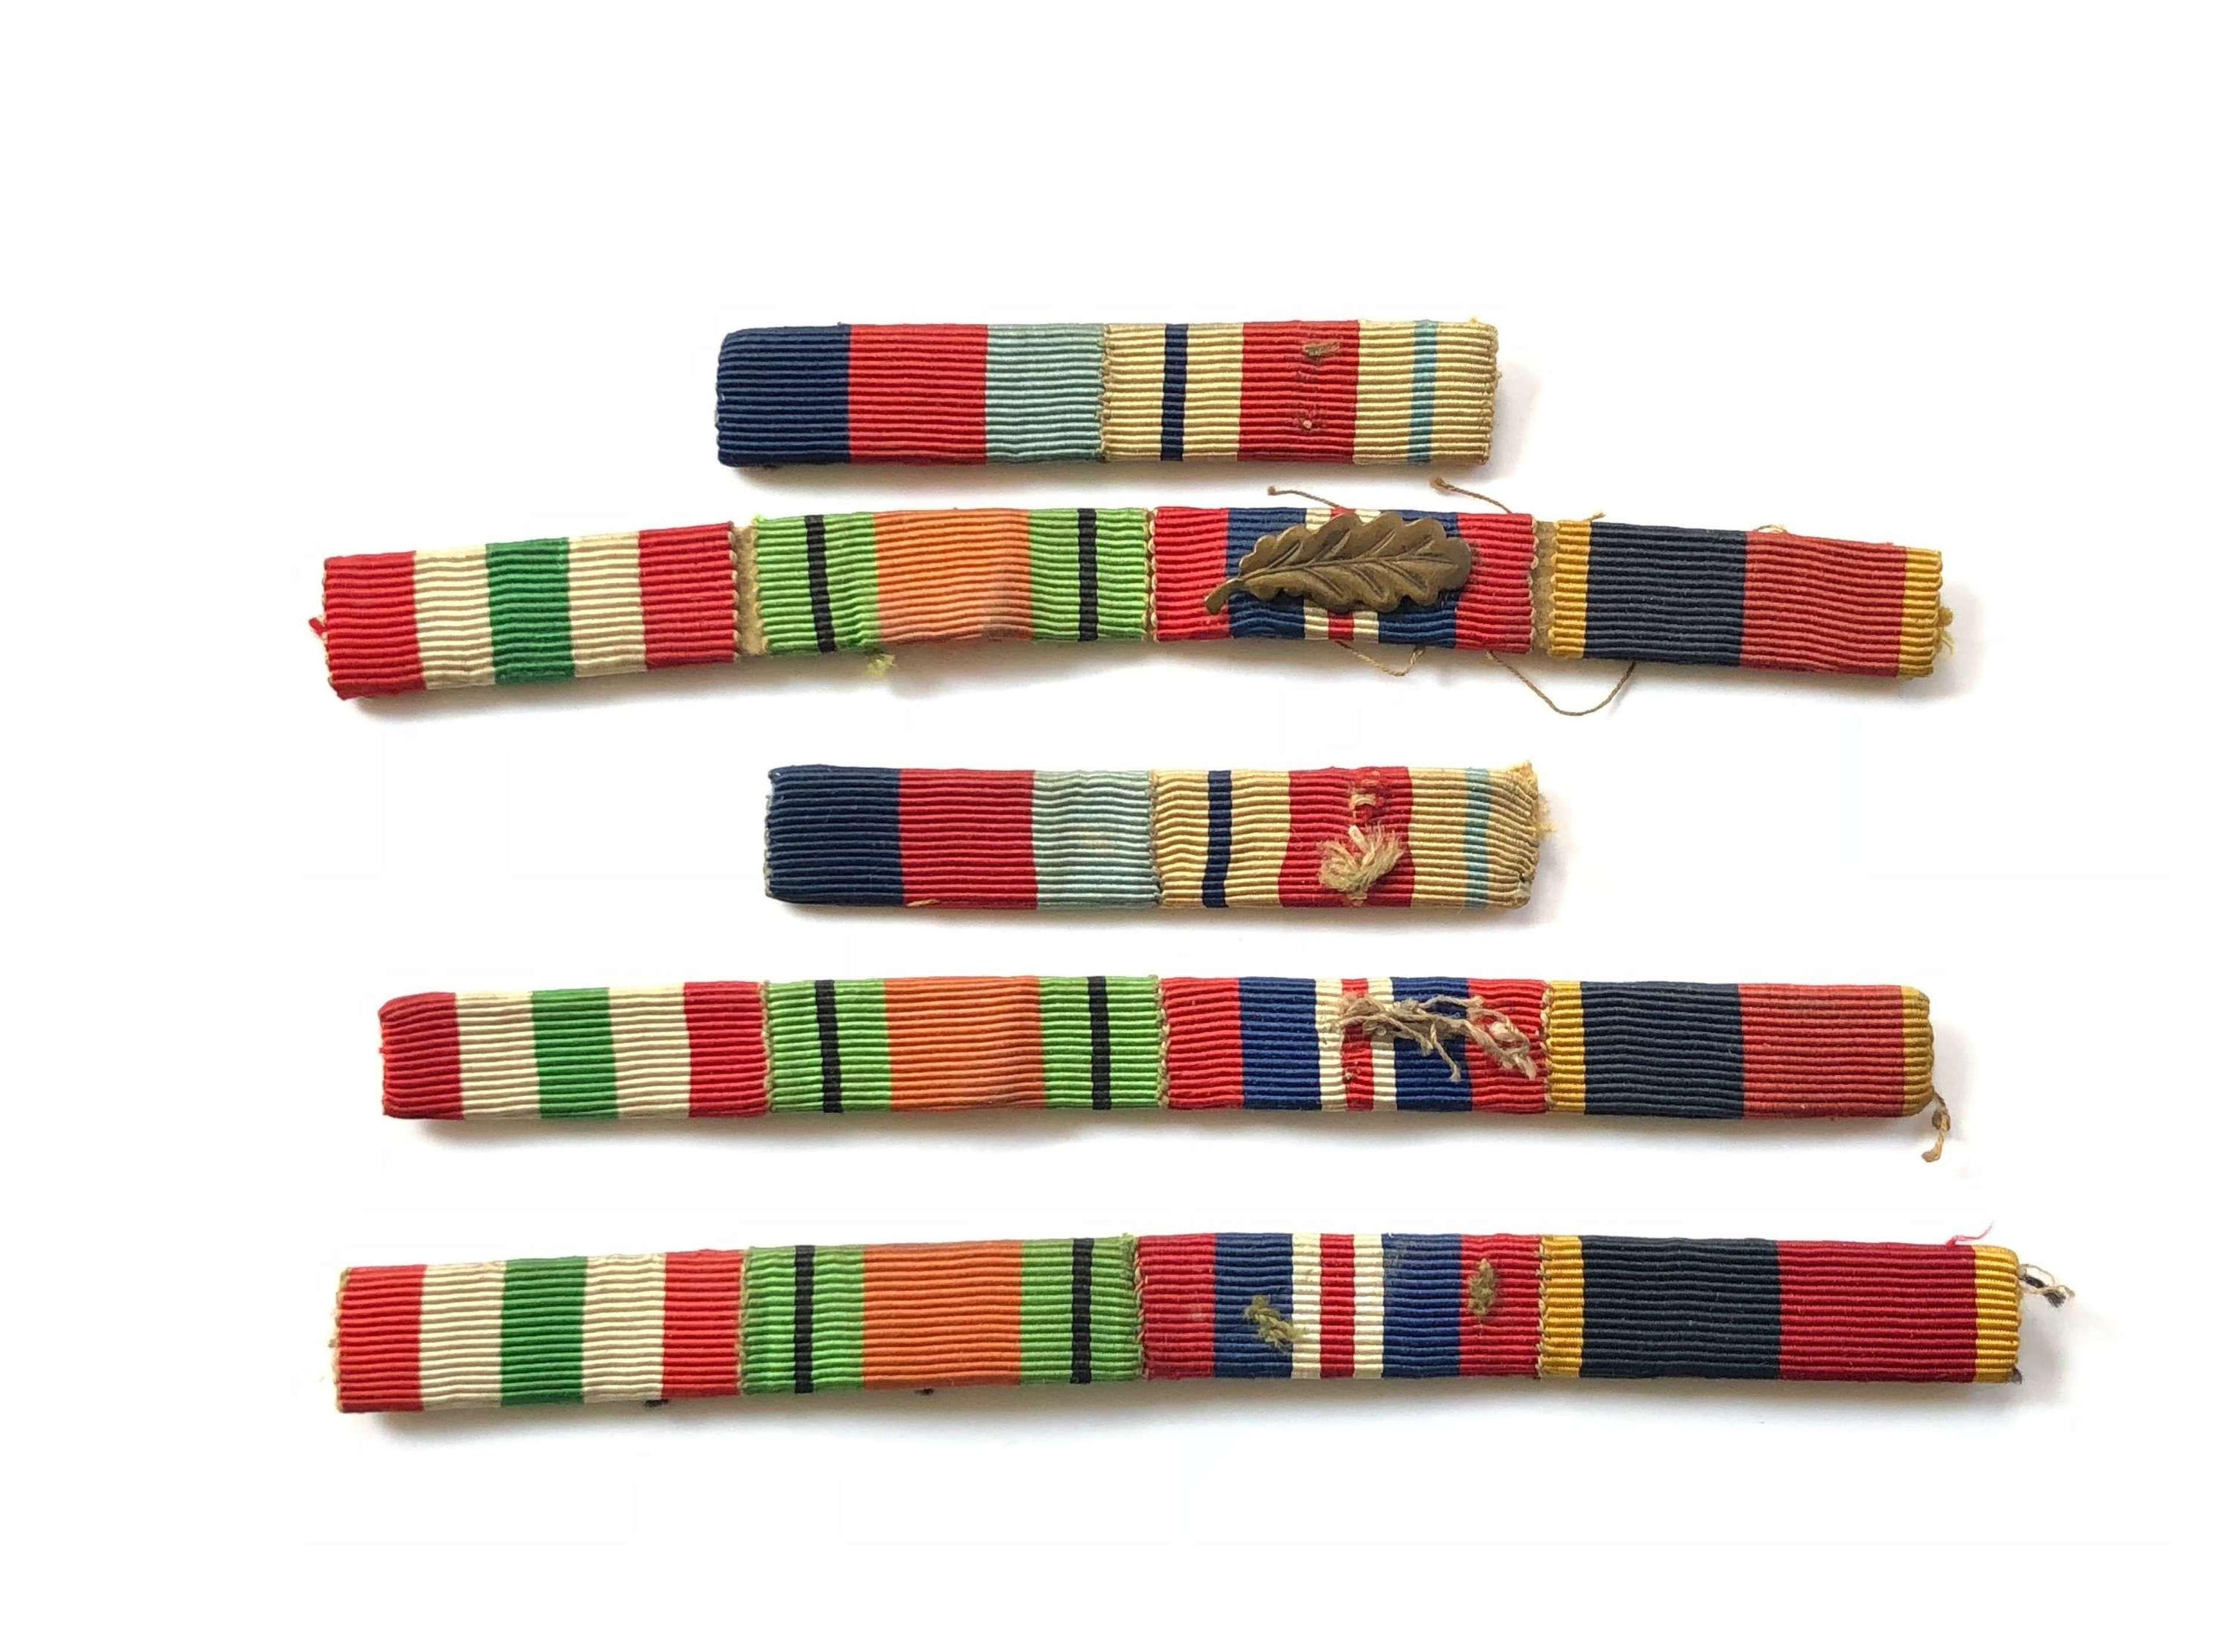 Honourable Artillery Company Uniform MID Medal Ribbons.